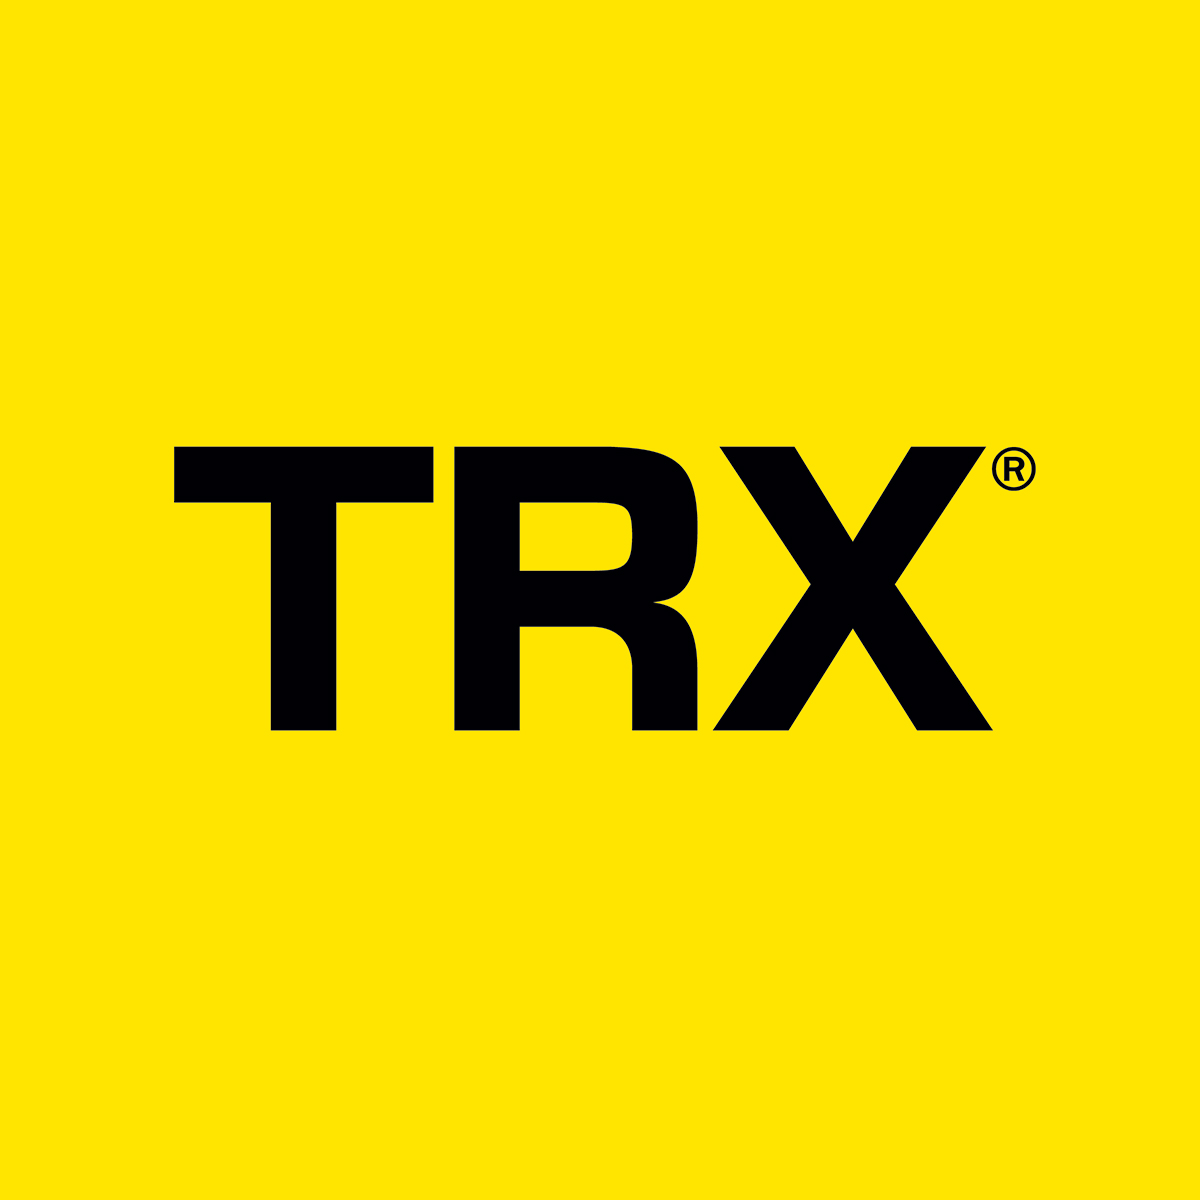 logo_trx